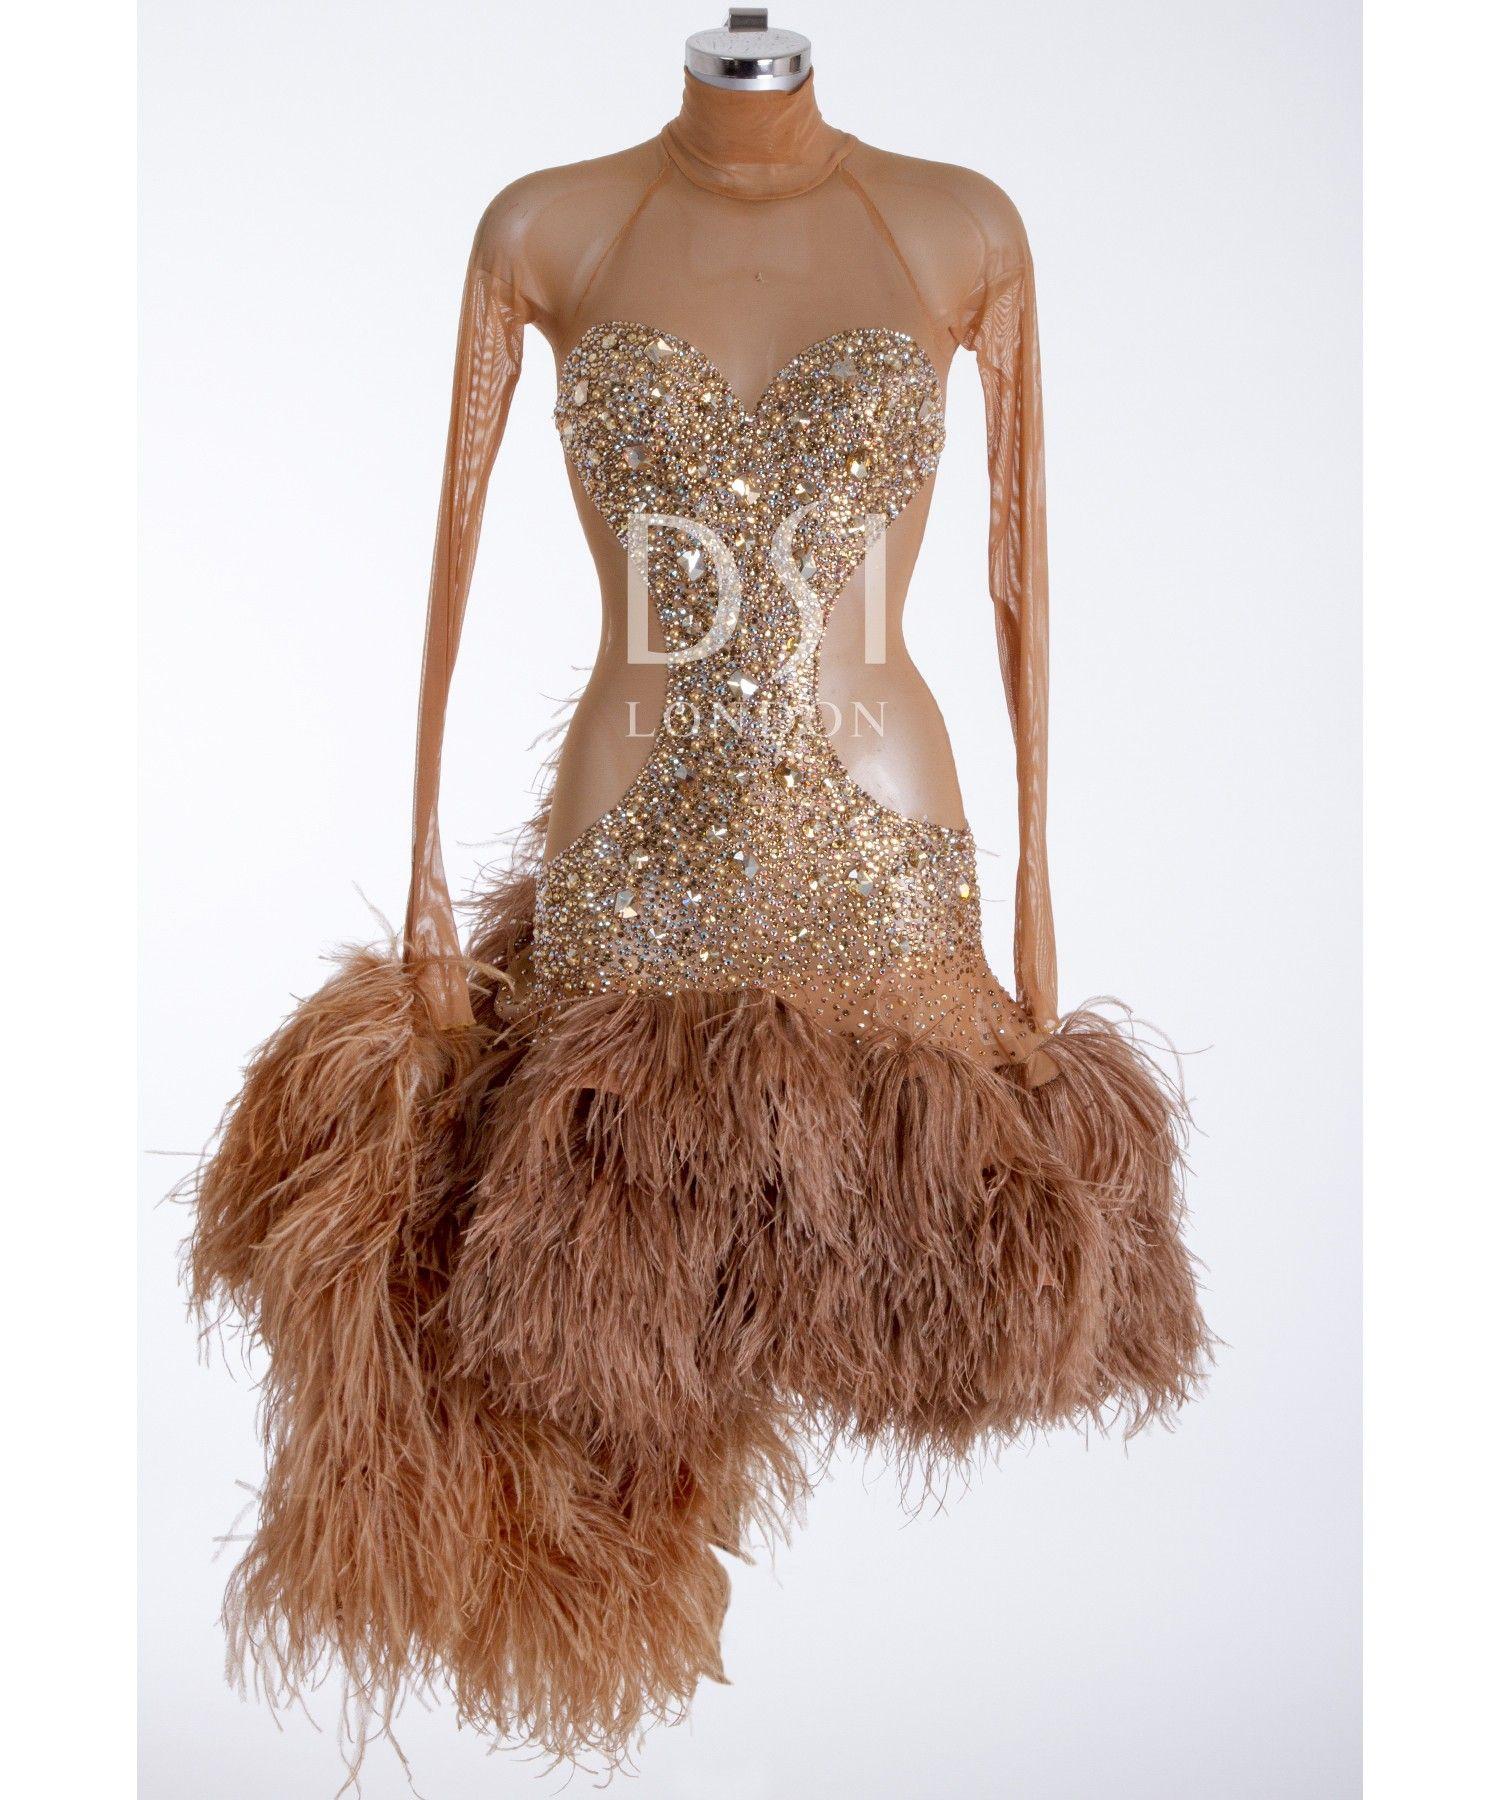 Veracruz Dresses, Veracruz, Jalisco, Jalisco Dresses, Jalisco Dress, Yucatan, Nayarit, Dresses, Dress, Folklorico Costumes, Folklorico Dresses, Folkorico, Dance.